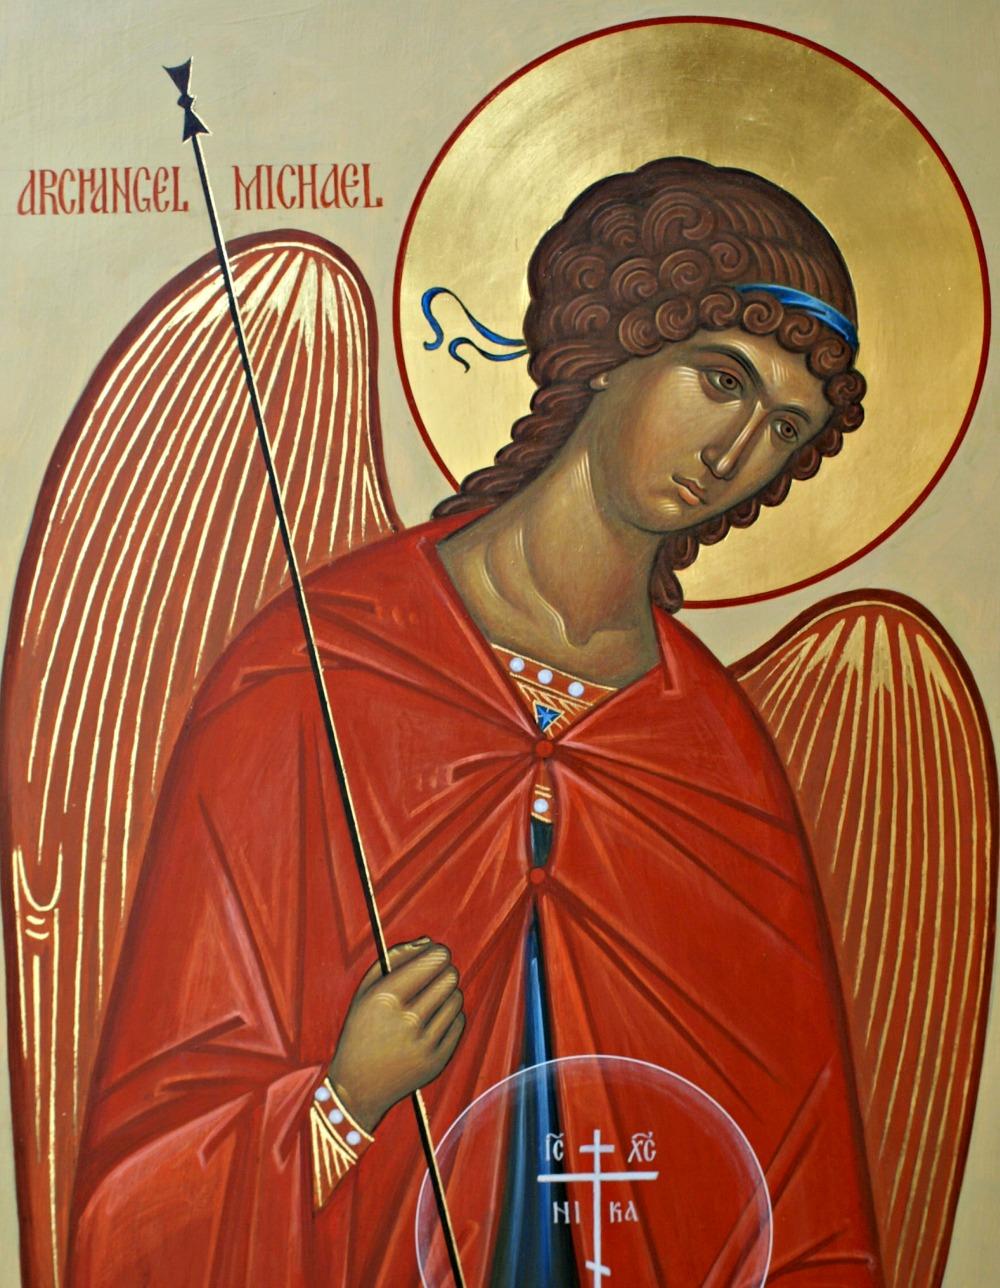 Fairbanks Archangel Michael.jpg